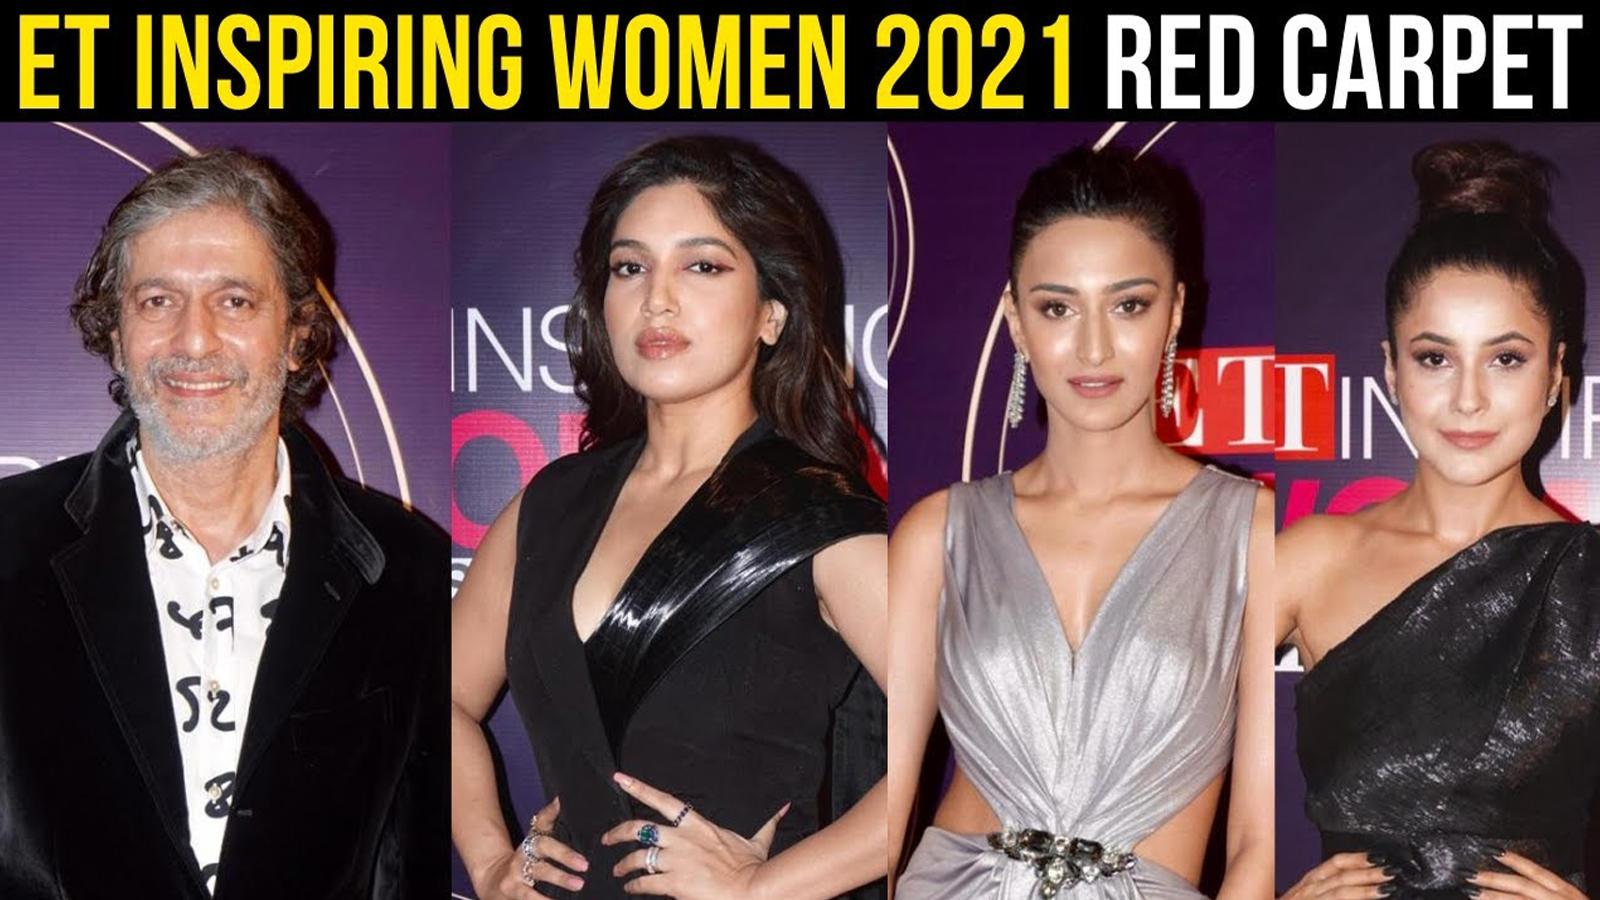 et-inspiring-women-2021-bhumi-pednekar-chunky-panday-erica-fernandes-shehnaaz-gill-red-carpet